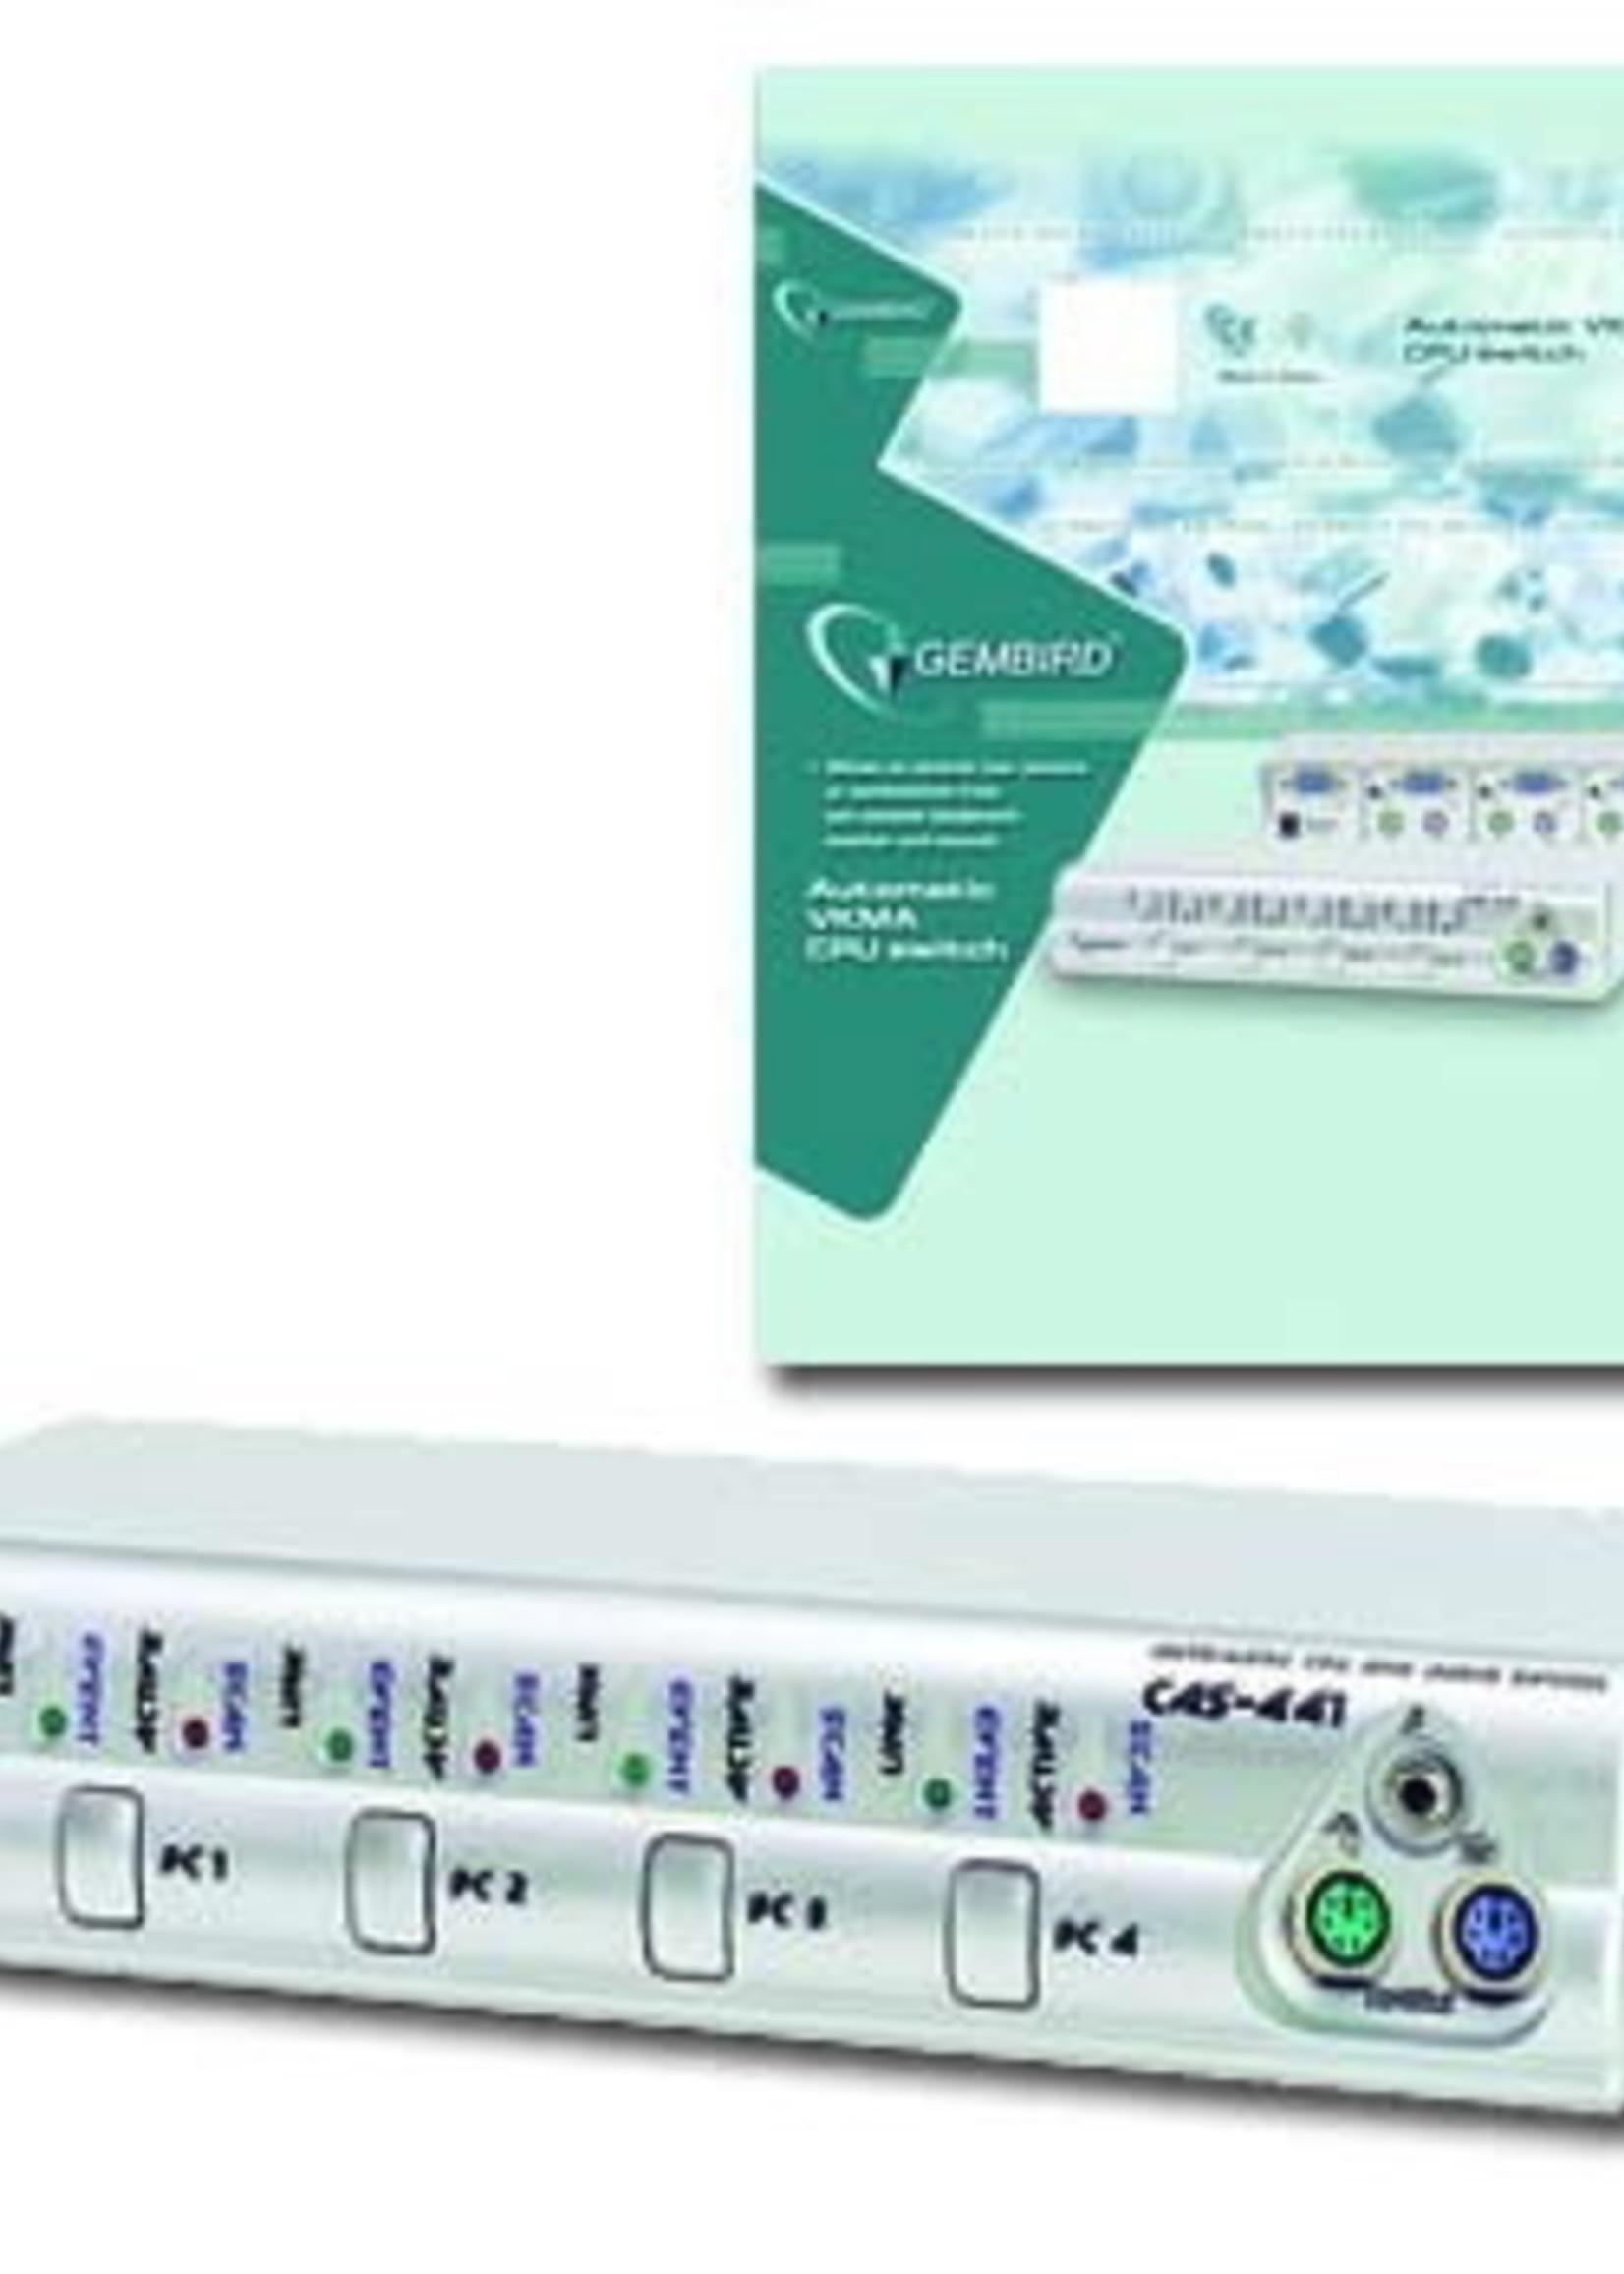 Gembird CAS-441 Automatische  CPU en audio switch, 4 PCs